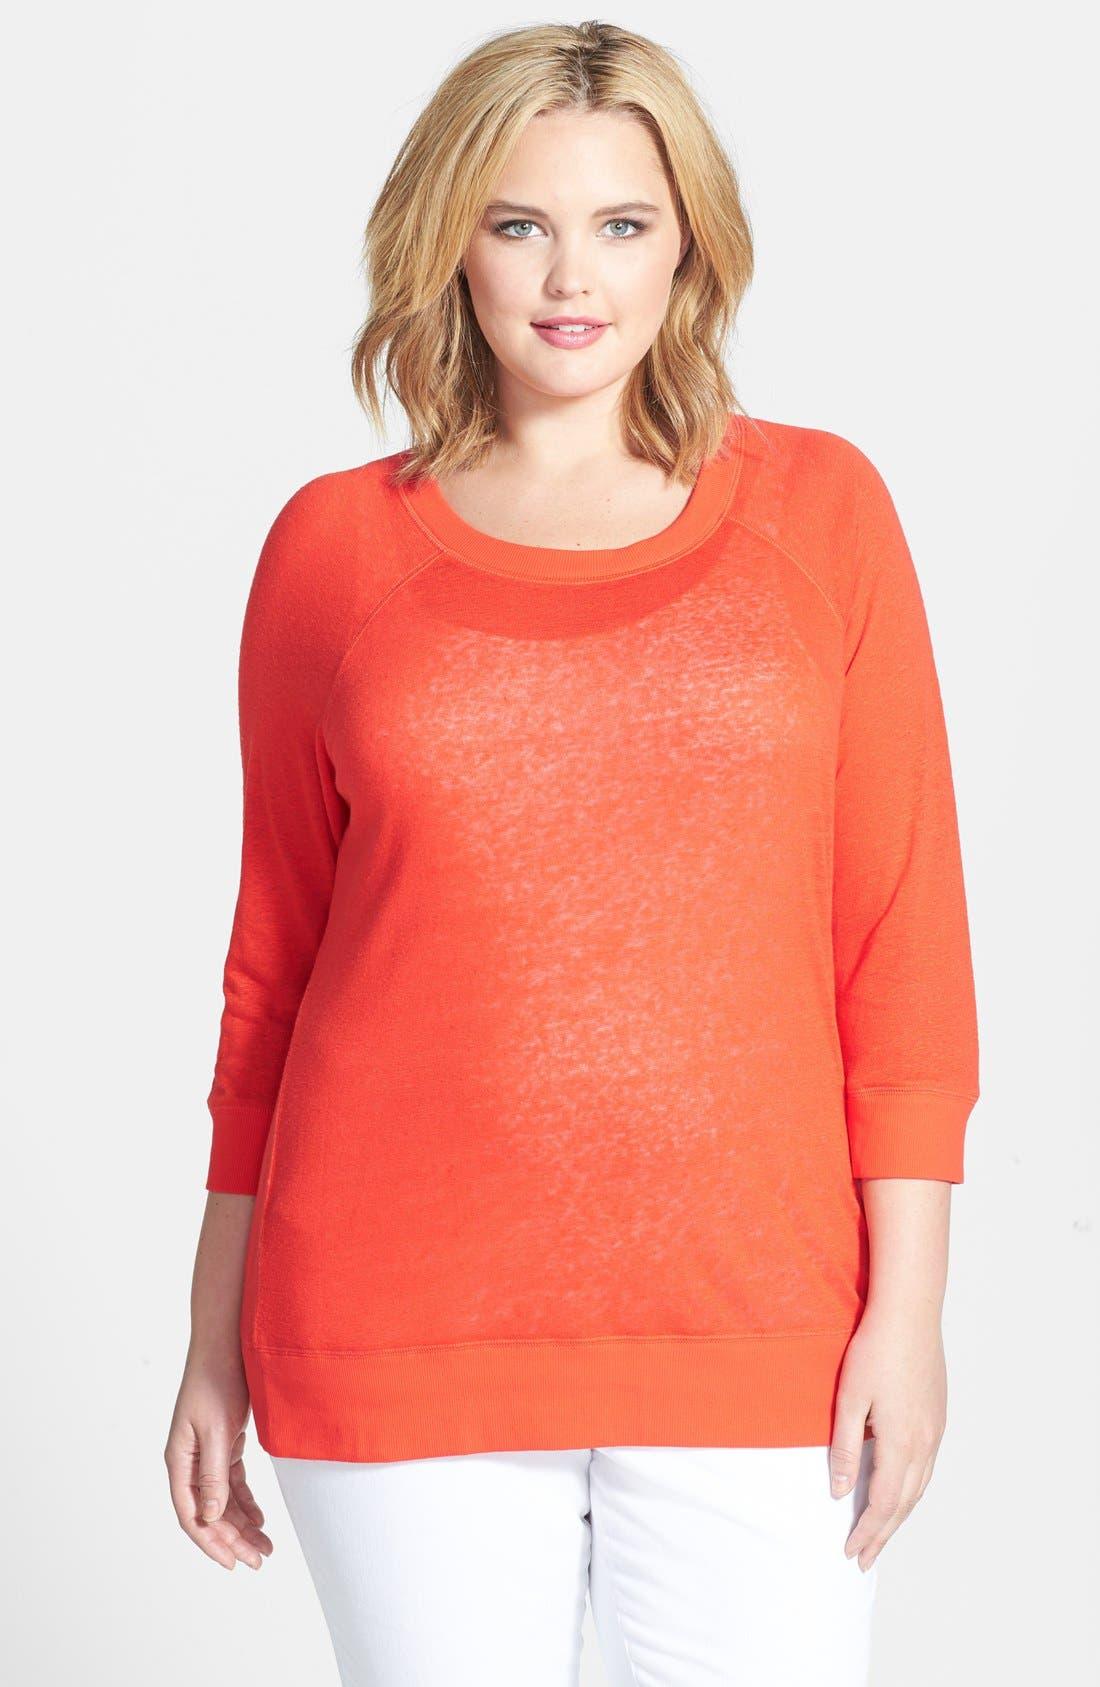 Alternate Image 1 Selected - Halogen® Three Quarter Sleeve Jersey Sweatshirt (Plus Size)